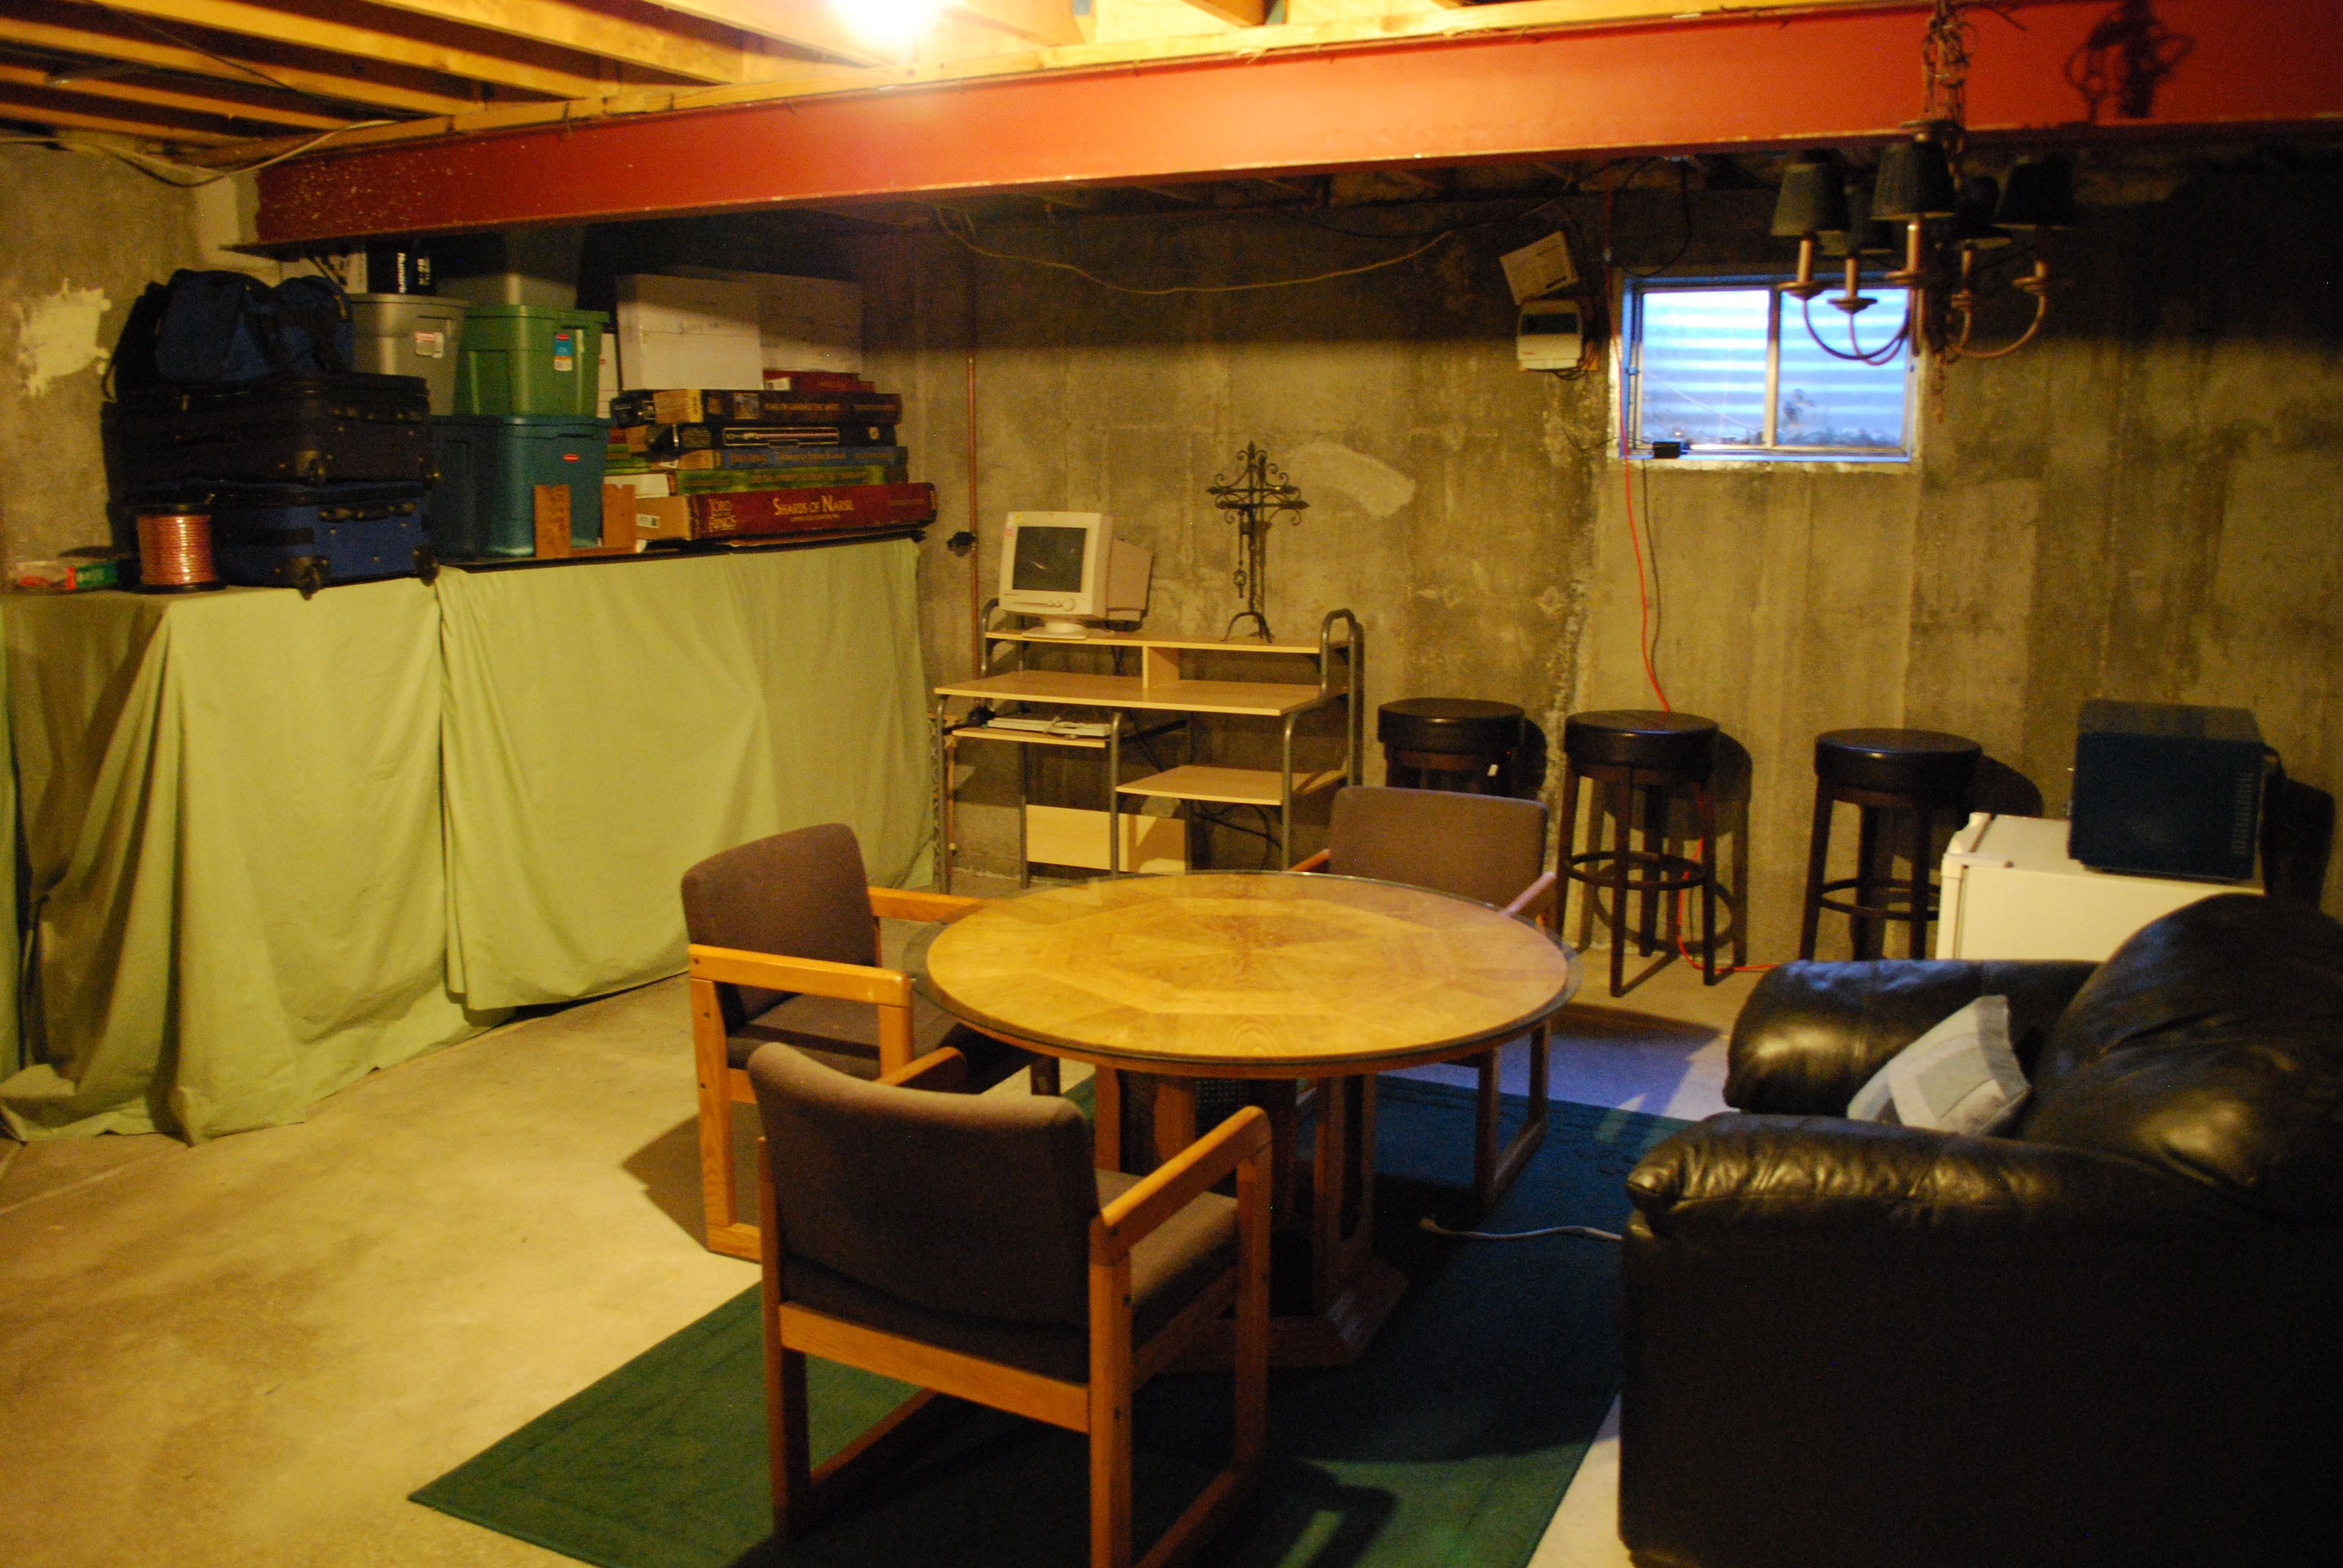 unfinished basement man cave Google Search man cave Pinterest